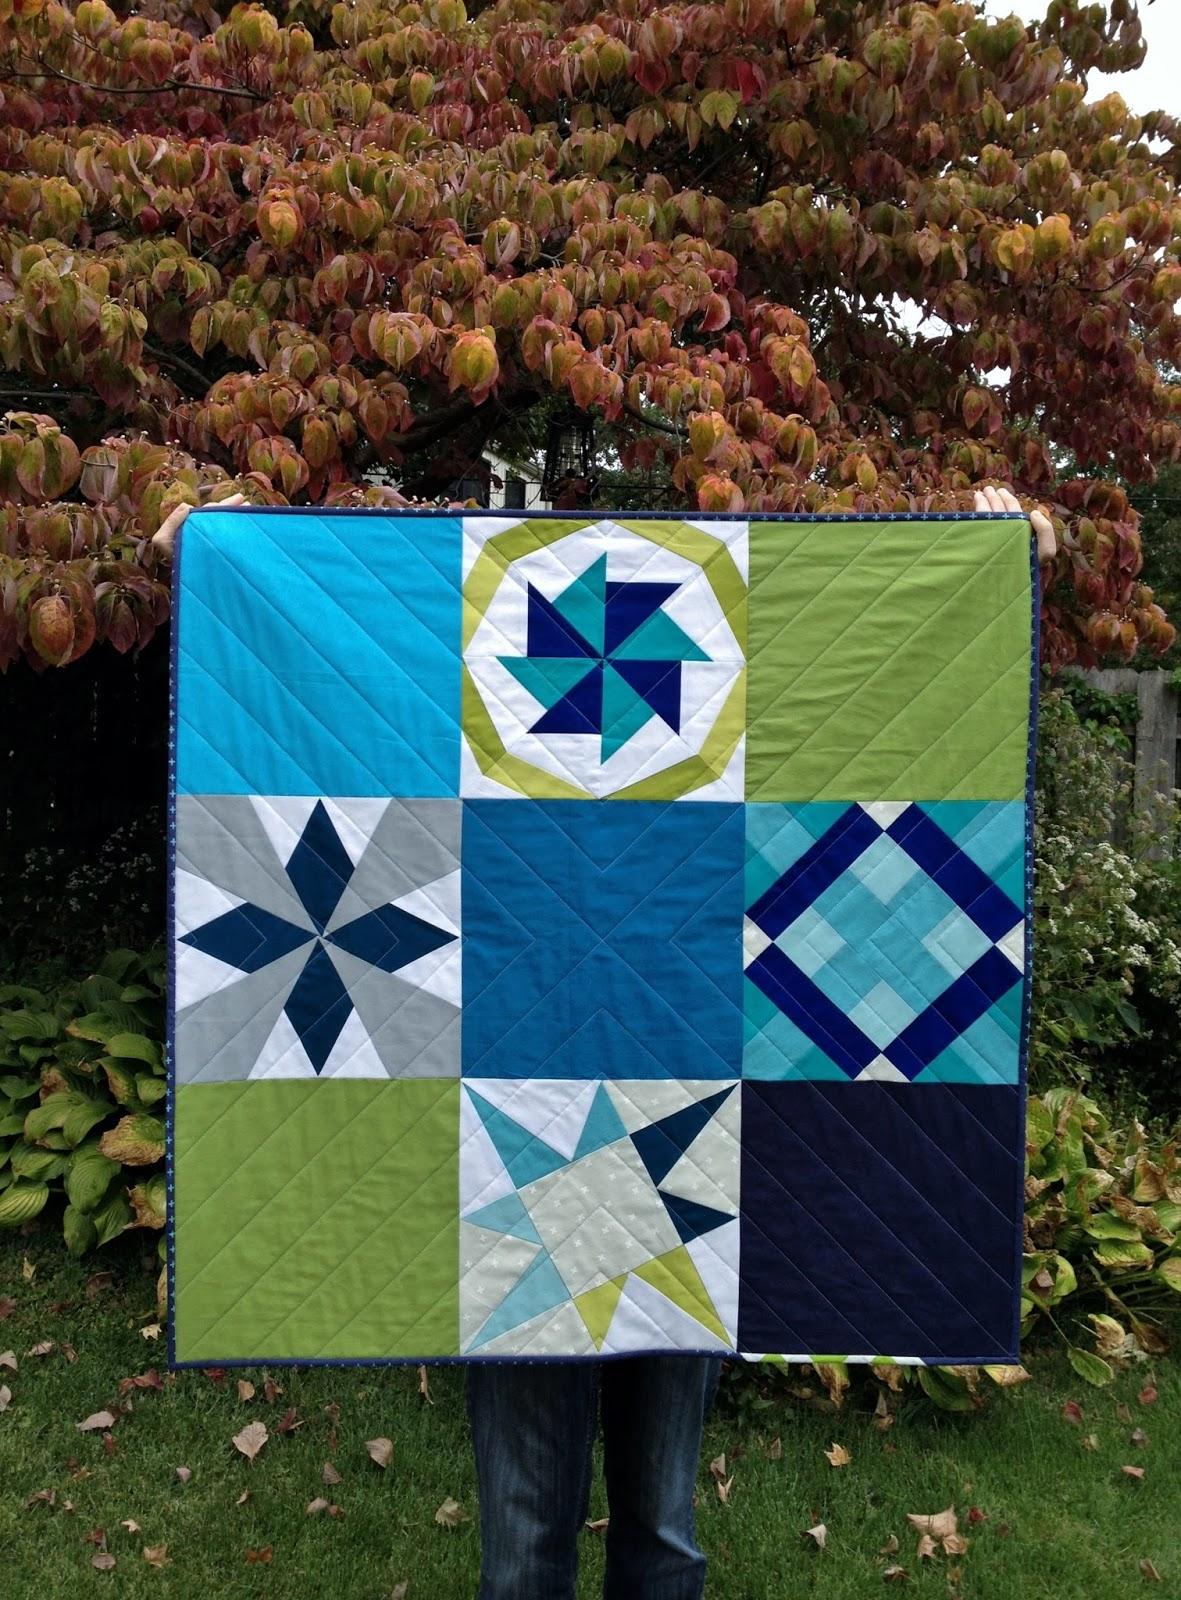 http://ablueskykindoflife.blogspot.com/2015/10/vqr-mini-sampler-quilt-finish.html